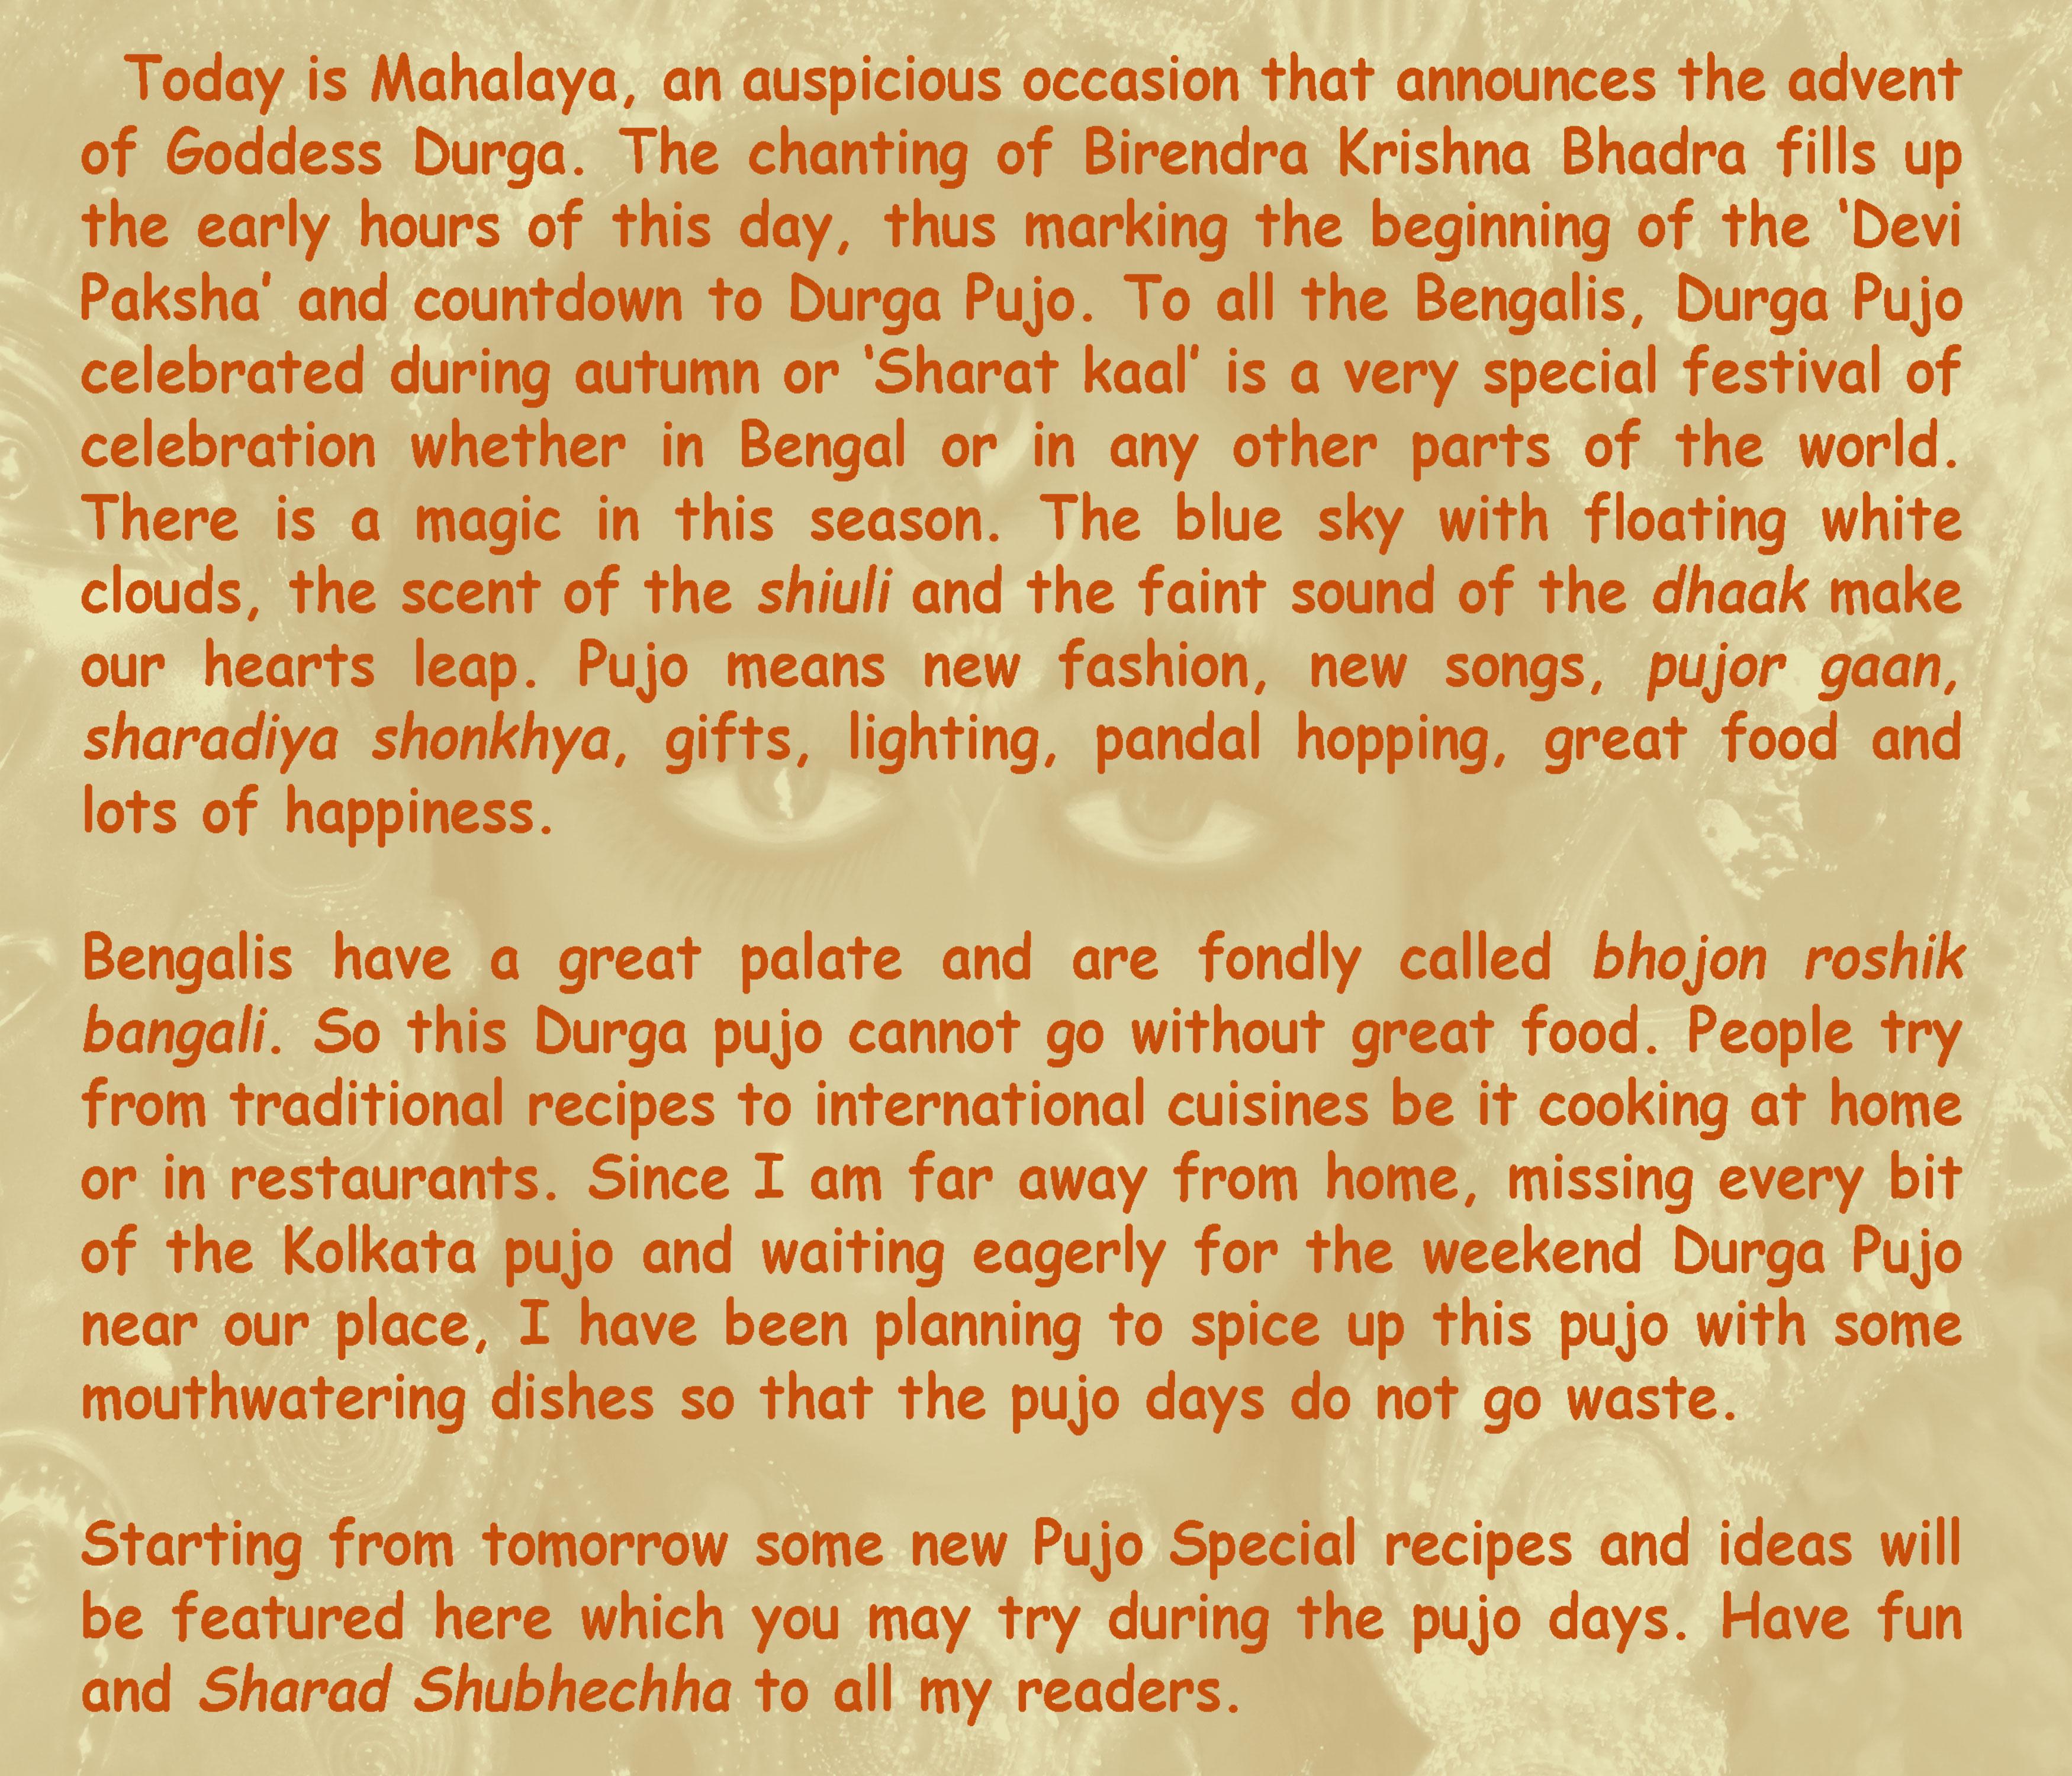 Durga Pujo 2012 : Countdown Begins…